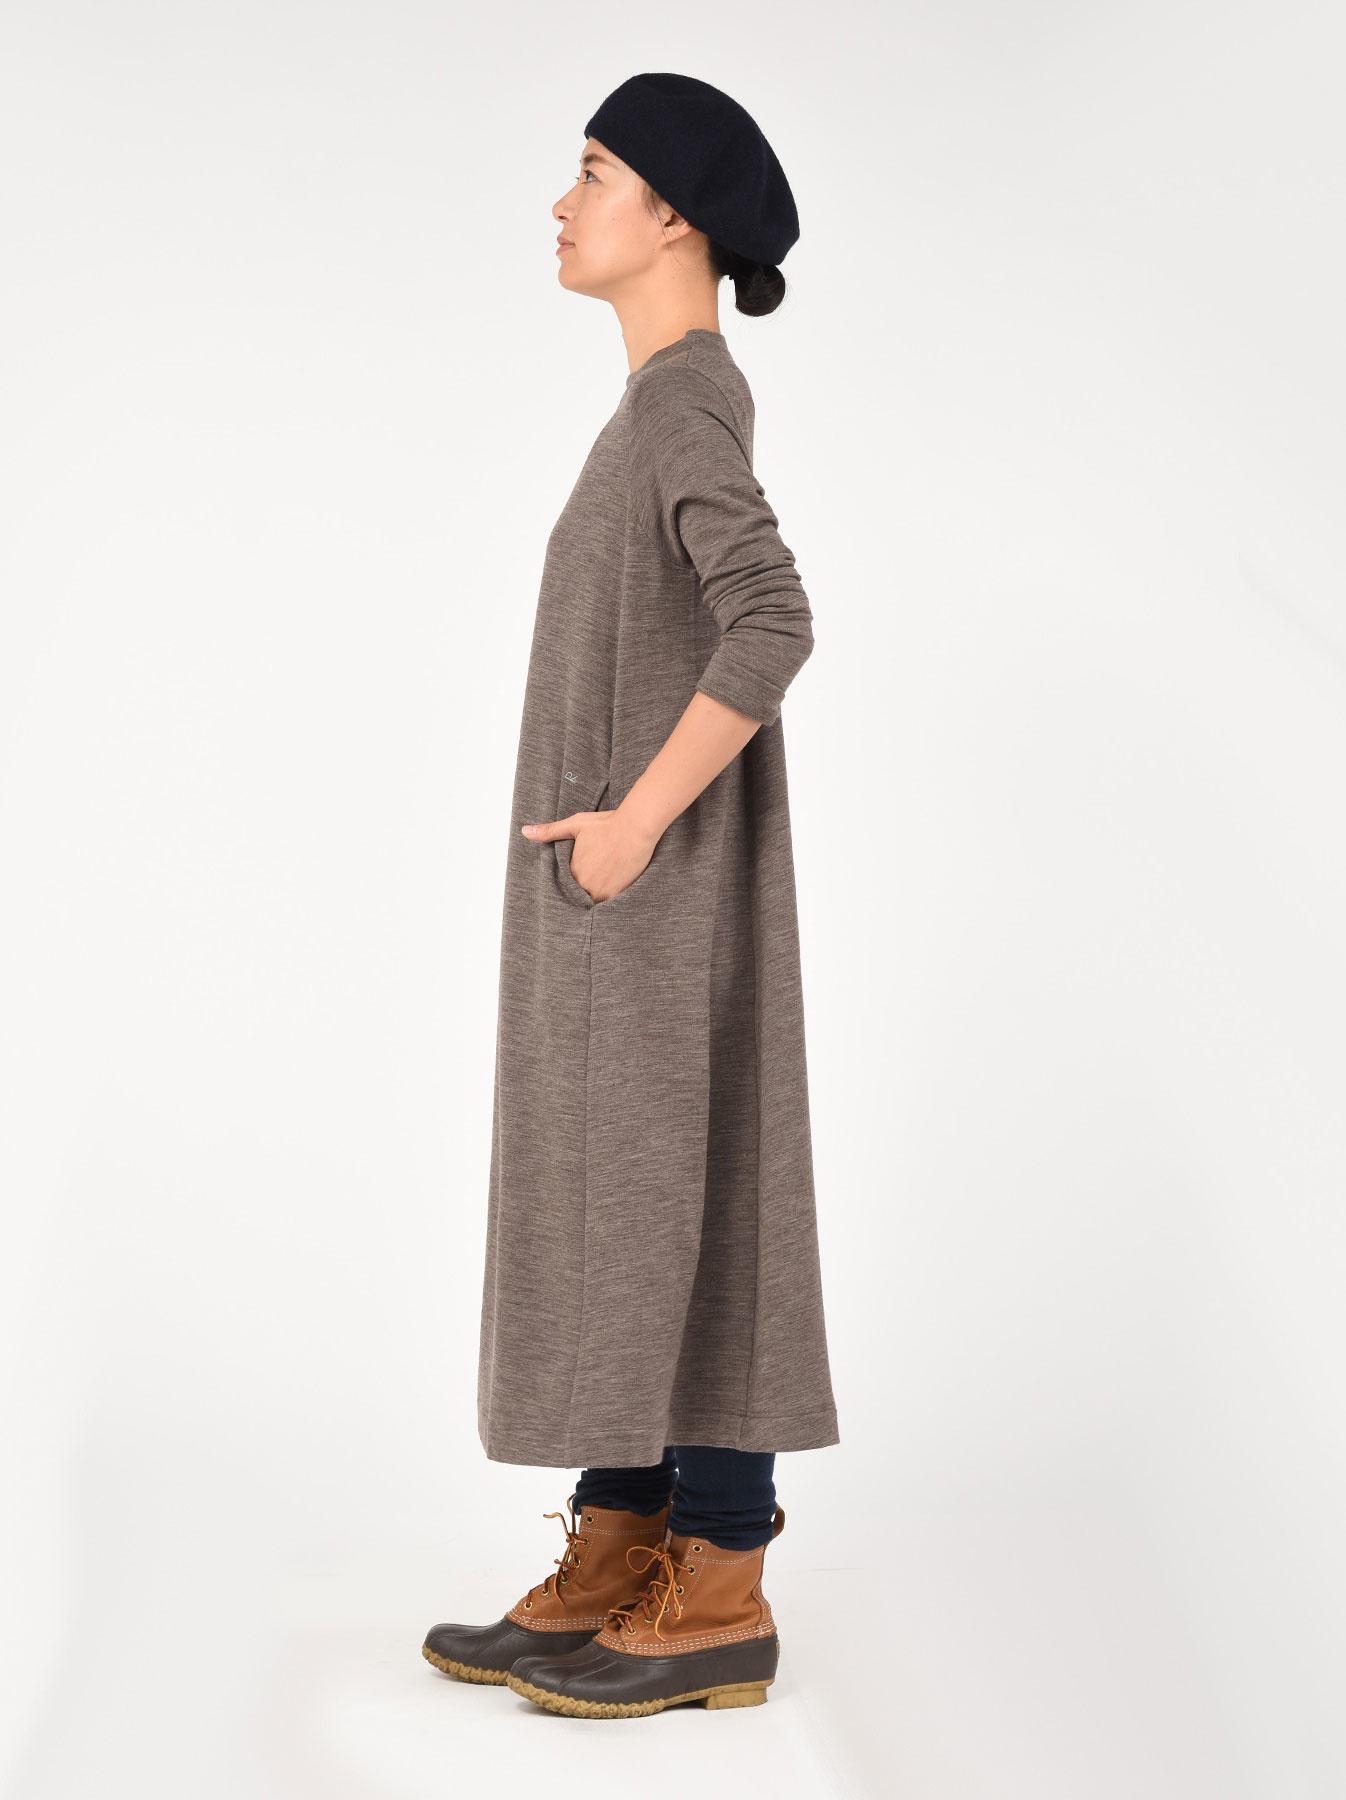 WH Washable Inlay 45 Dress-3